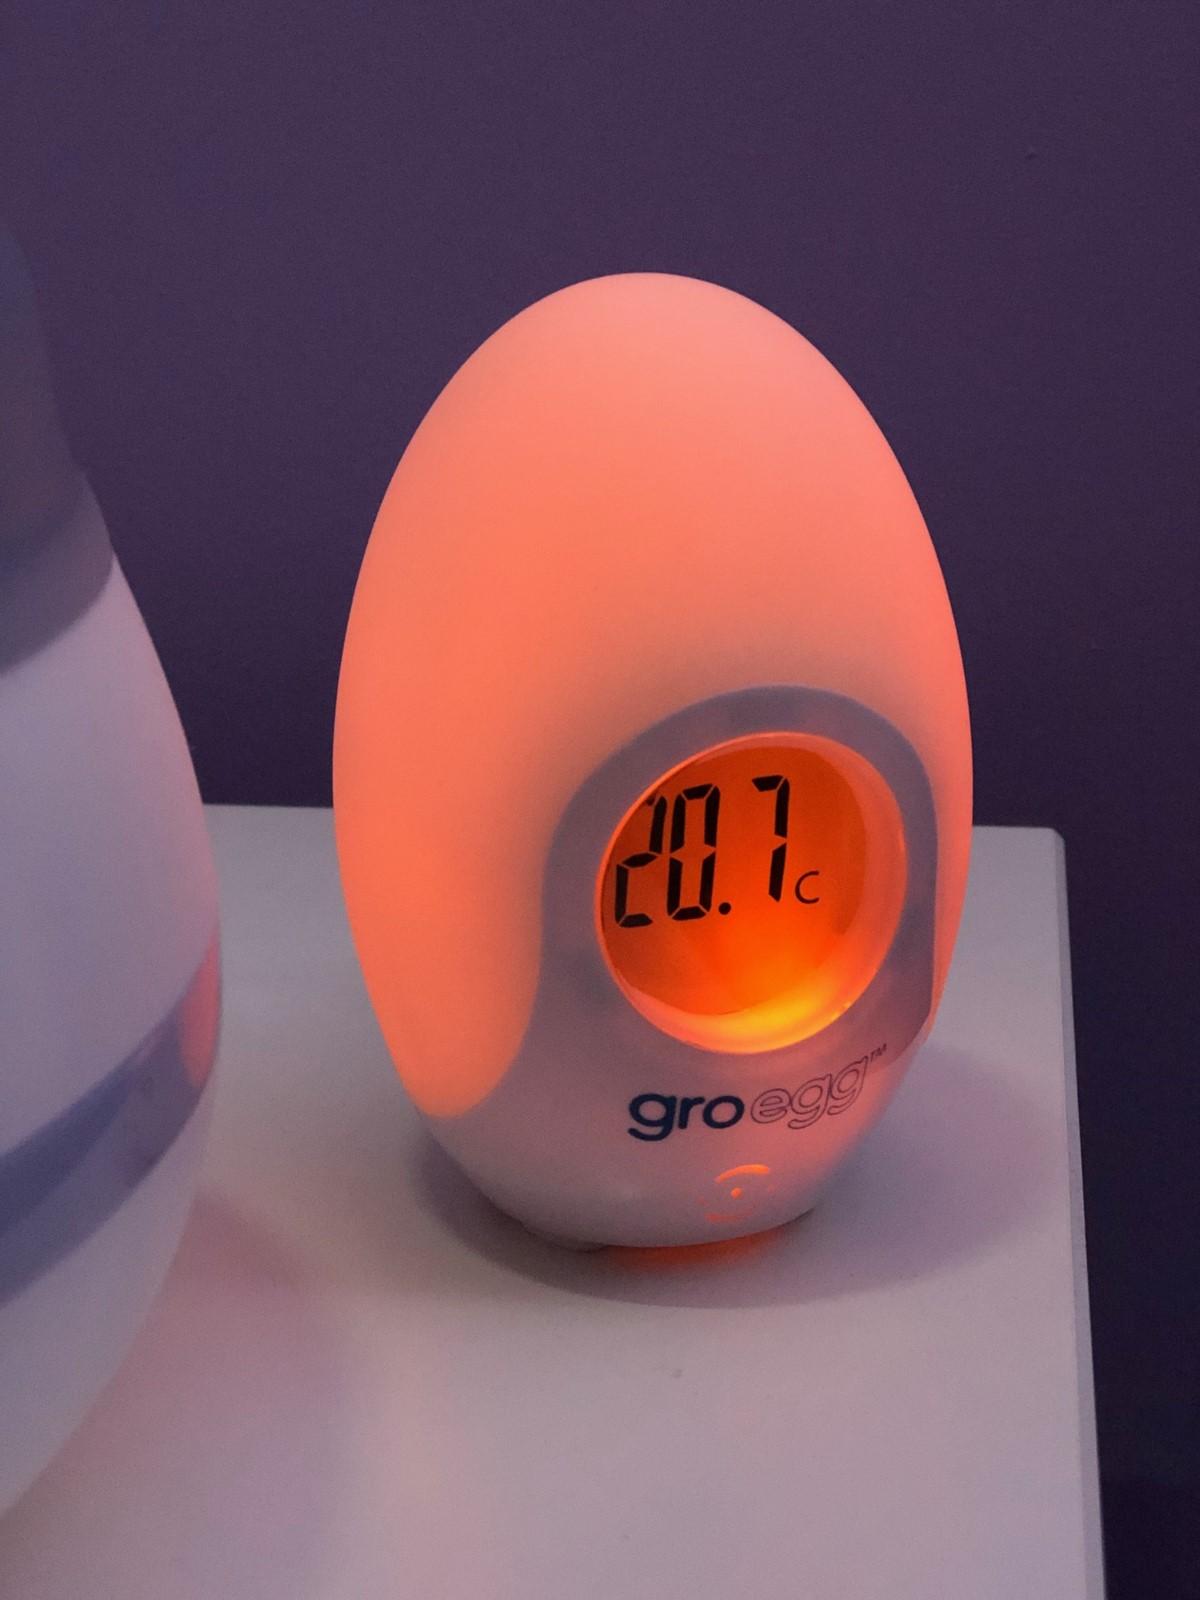 termometr gro egg opinie